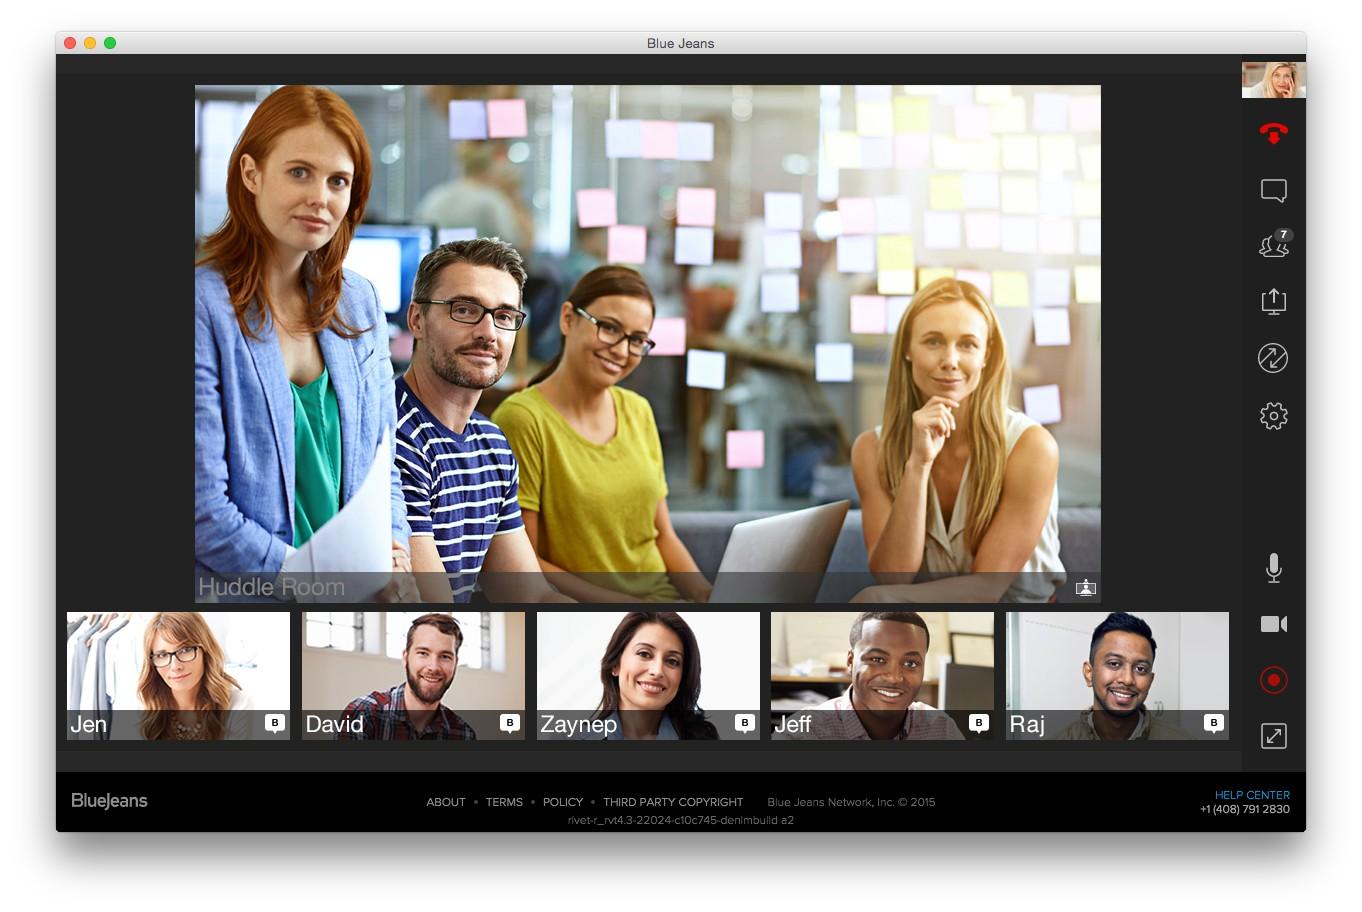 Smarte Helfer Büro 4.0: Blue Jeans von Blue Jeans Network